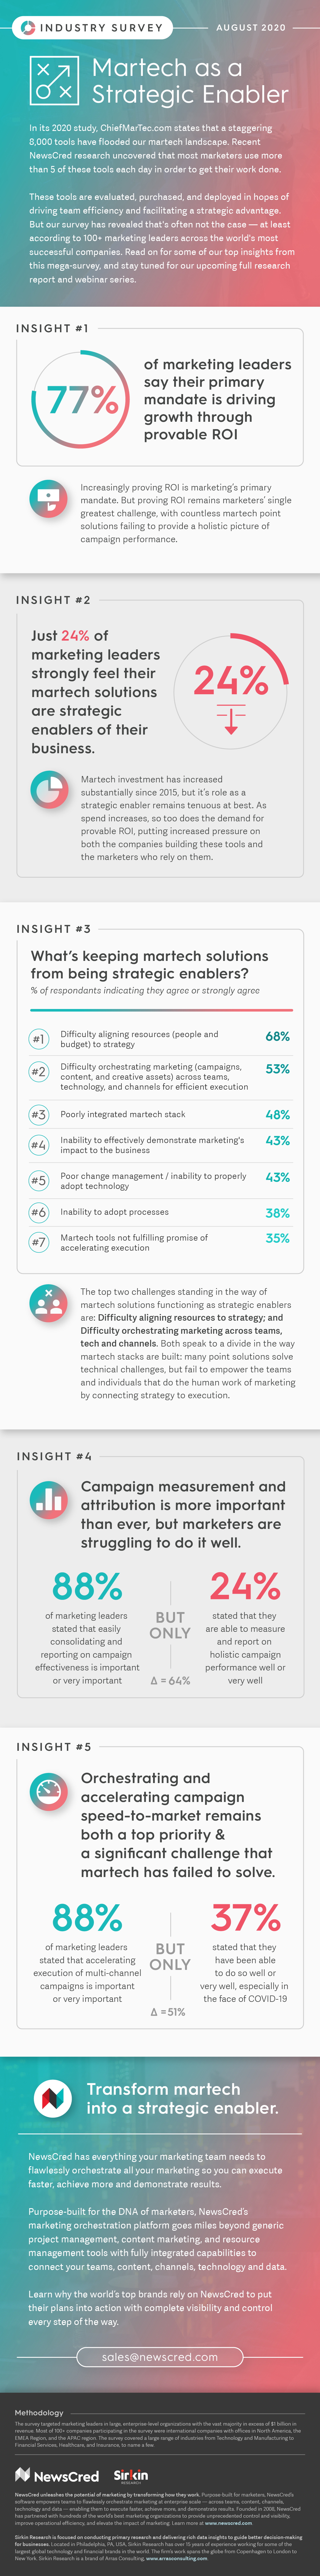 Martech Strategic Enabler Infographic 2020 (1).png